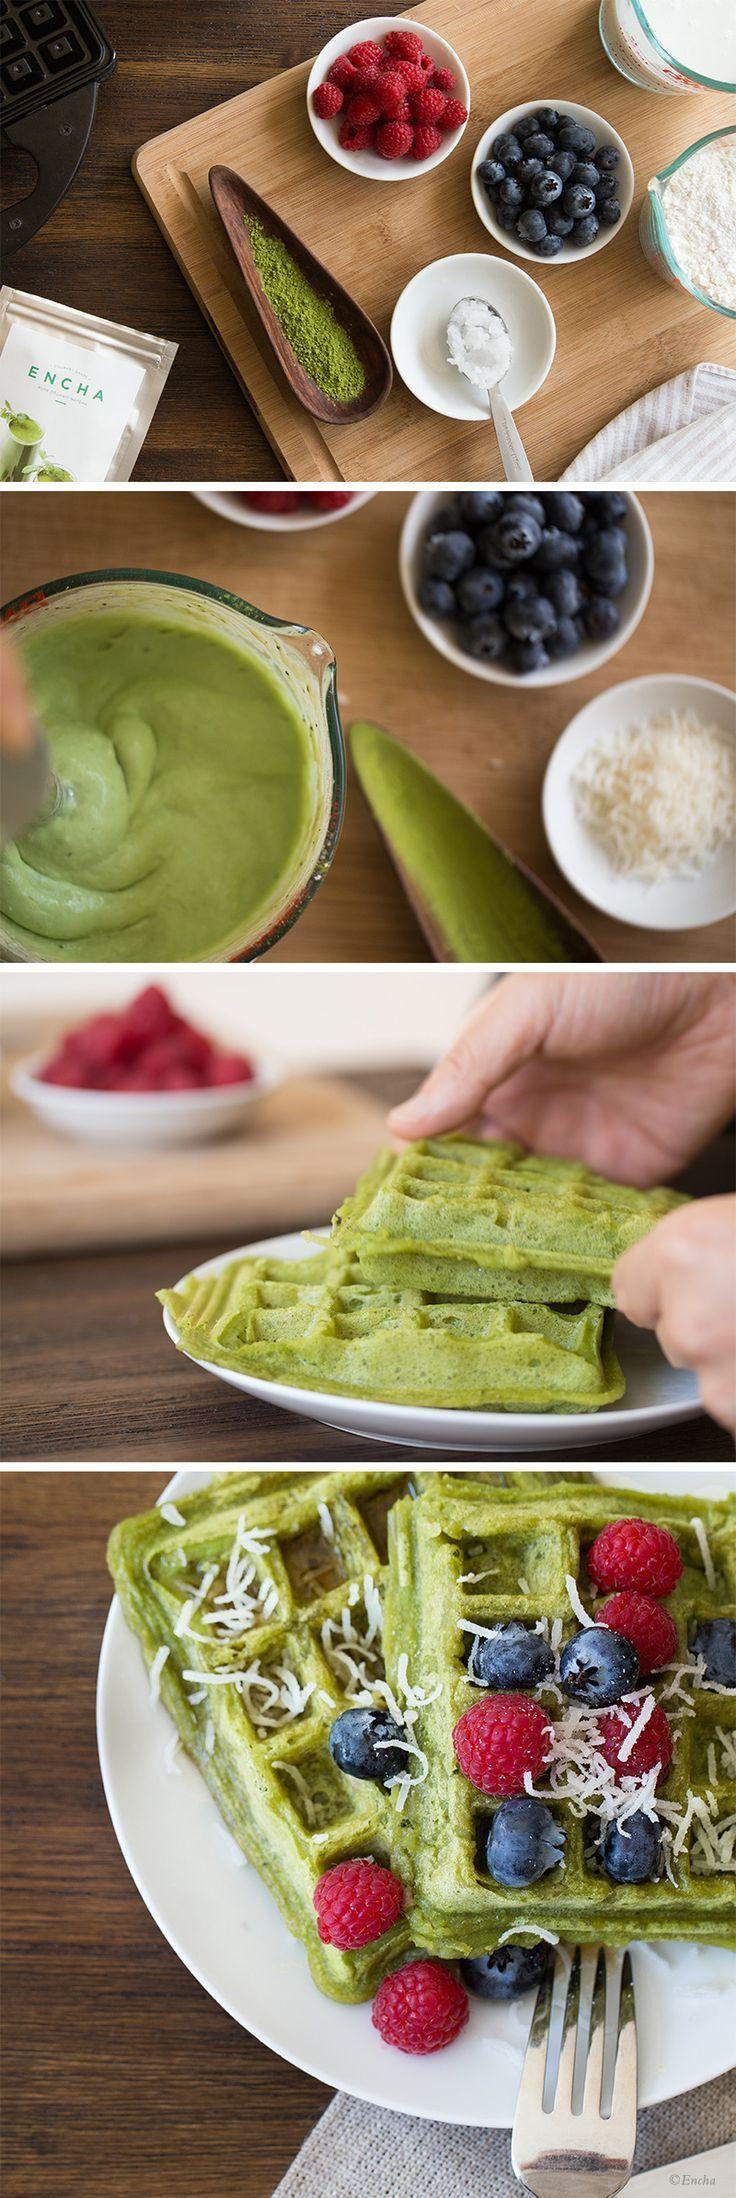 Matcha Waffle Recipe: Vegan Gluten-Free Coconut Encha Organic Matcha Waffle | http://encha.com | #vegan #waffle #matcha